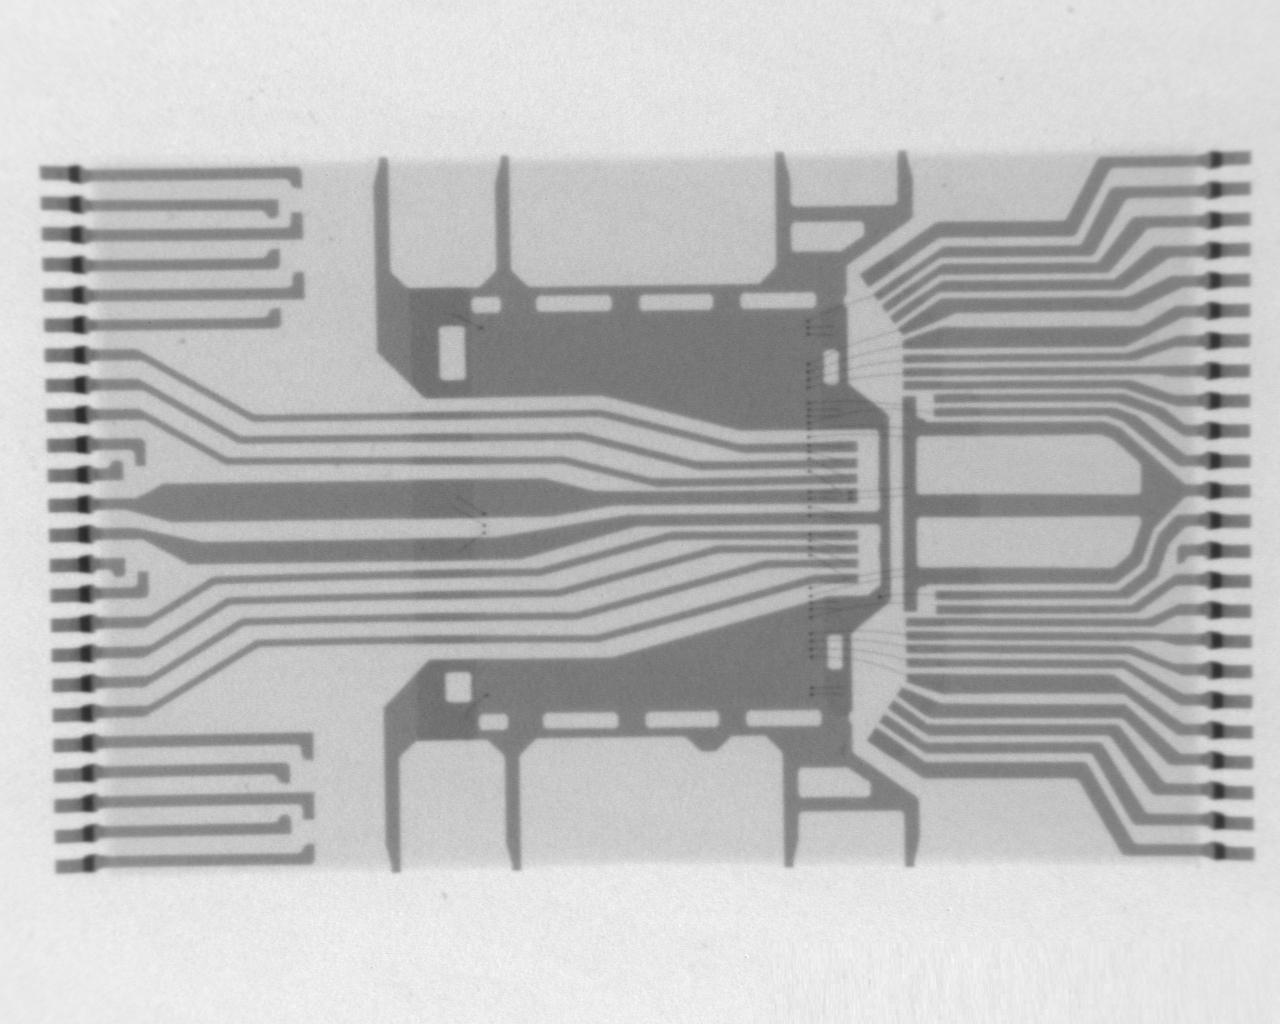 NAND FLASH芯片在X-RAY下的景象